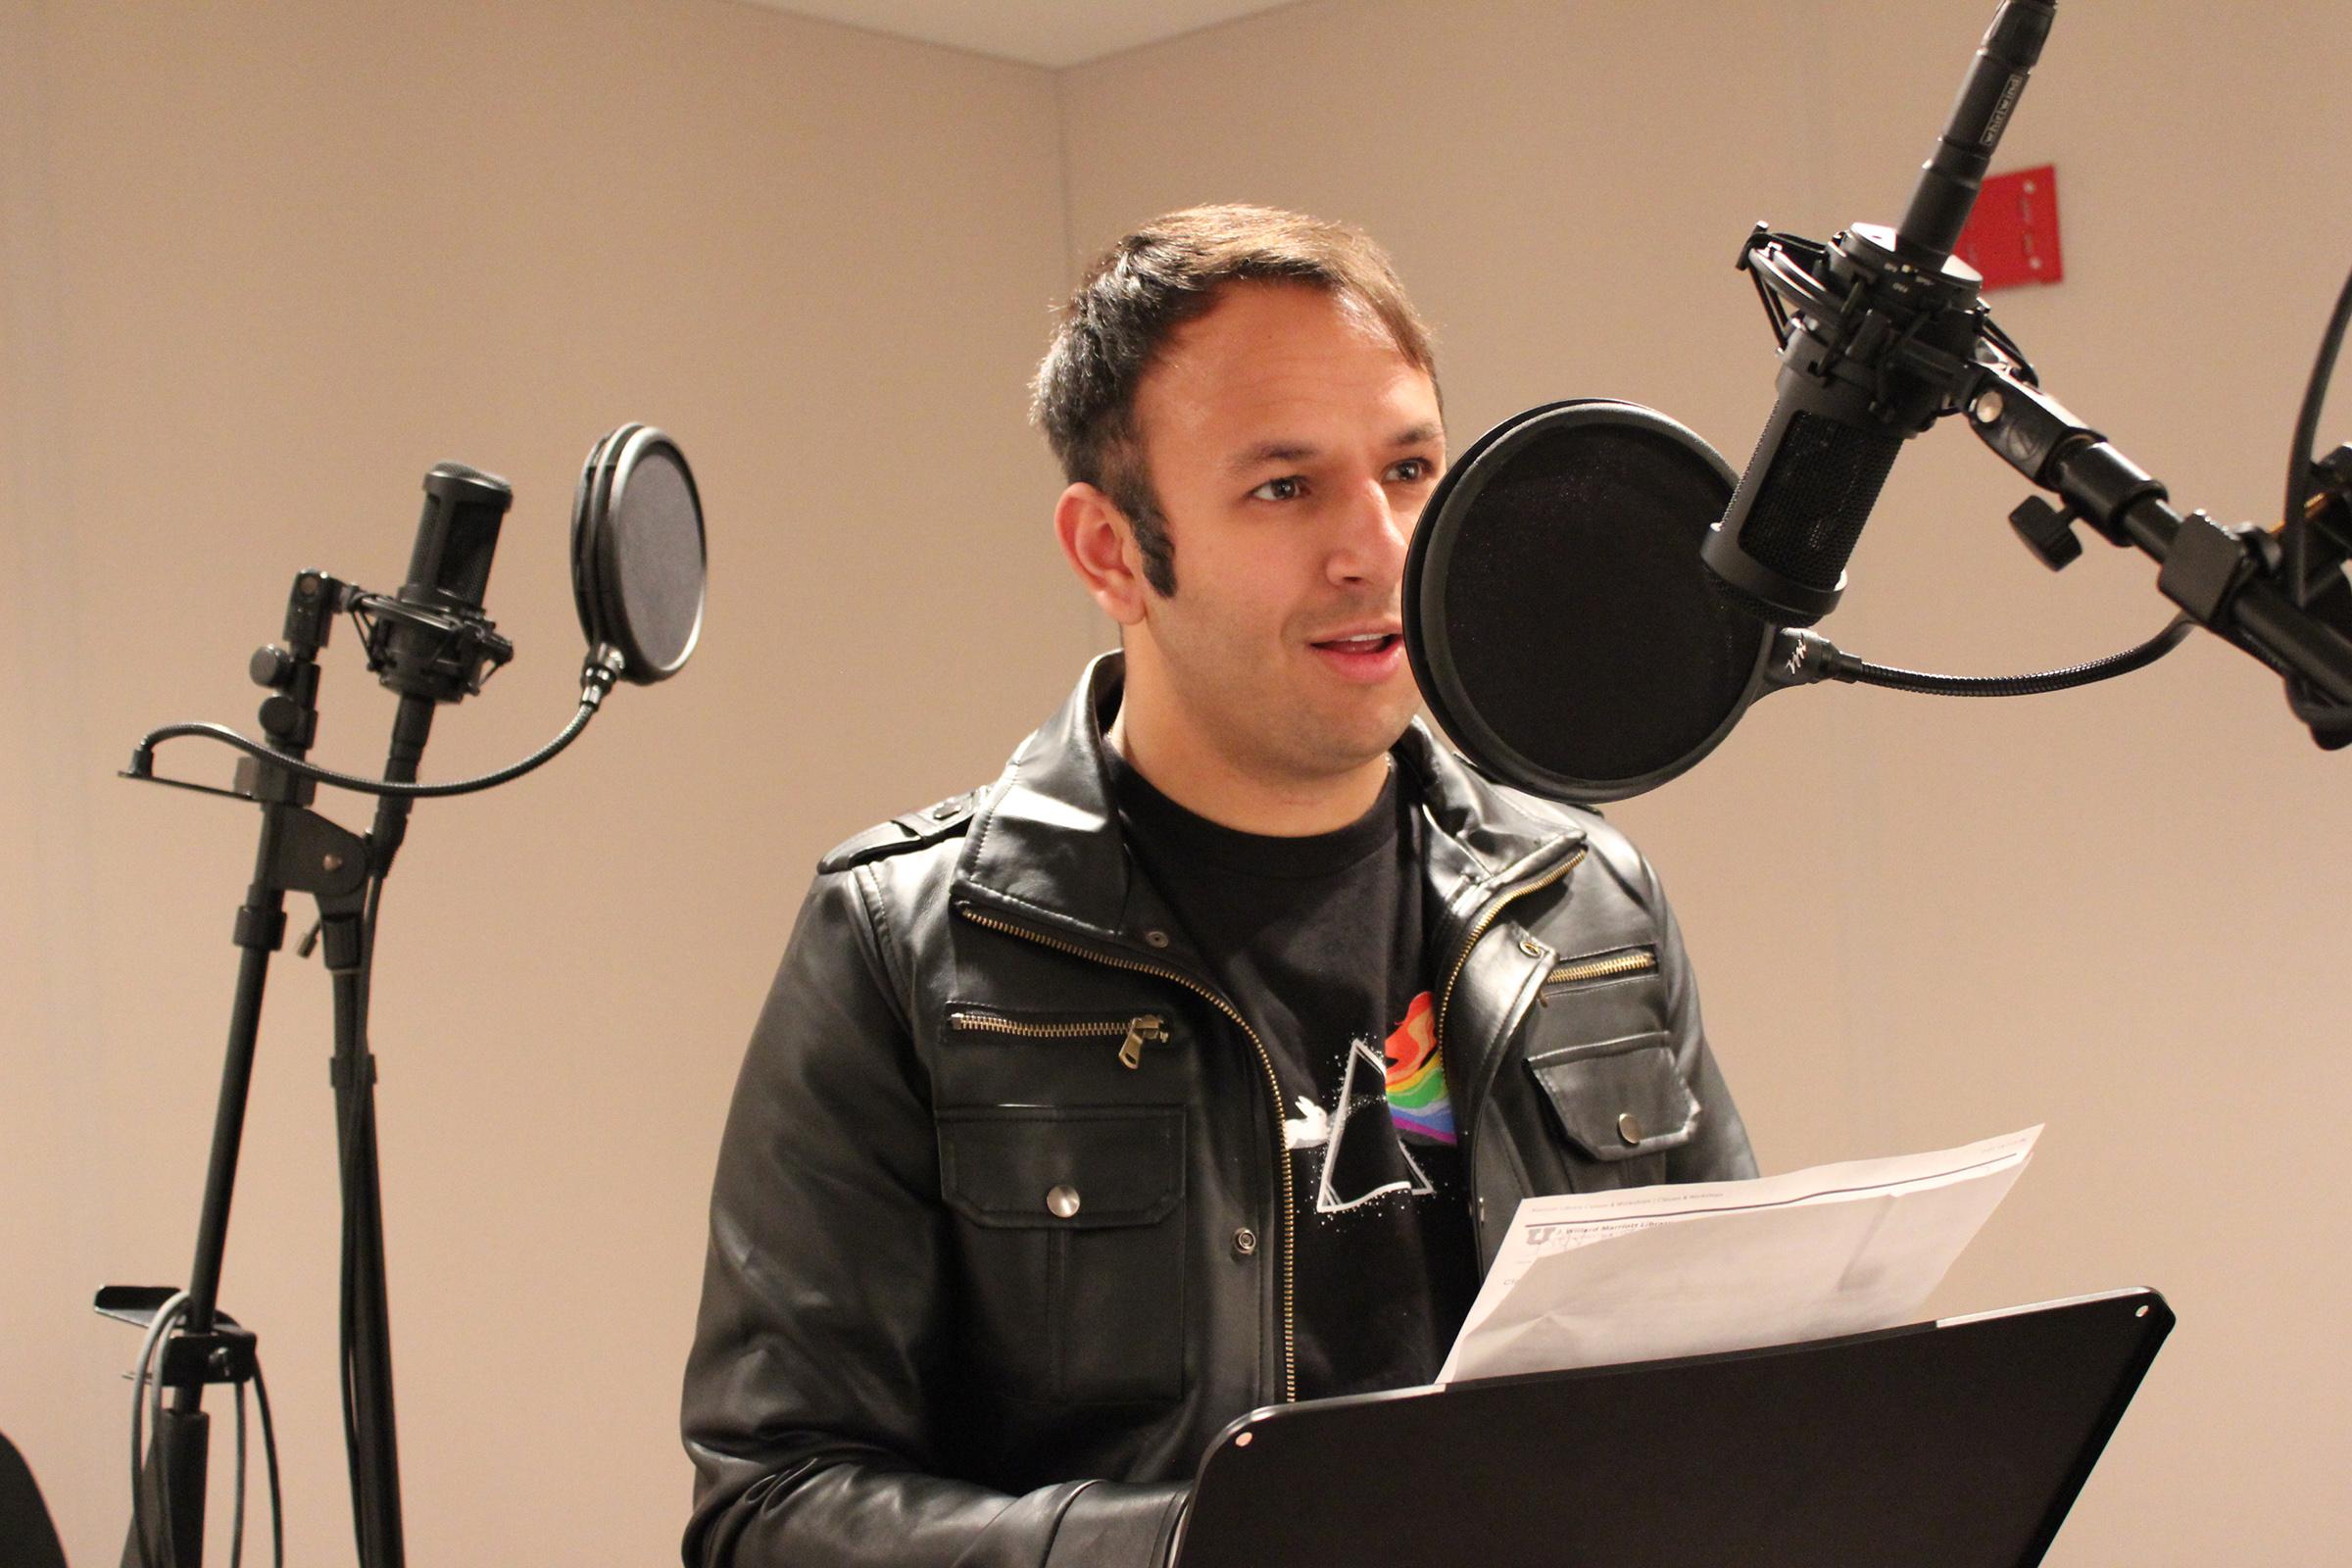 Jordan Hanzon, a student at the U, uses the audio studio in the J. Willard Marriott Library's Digital Scholarship Lab.